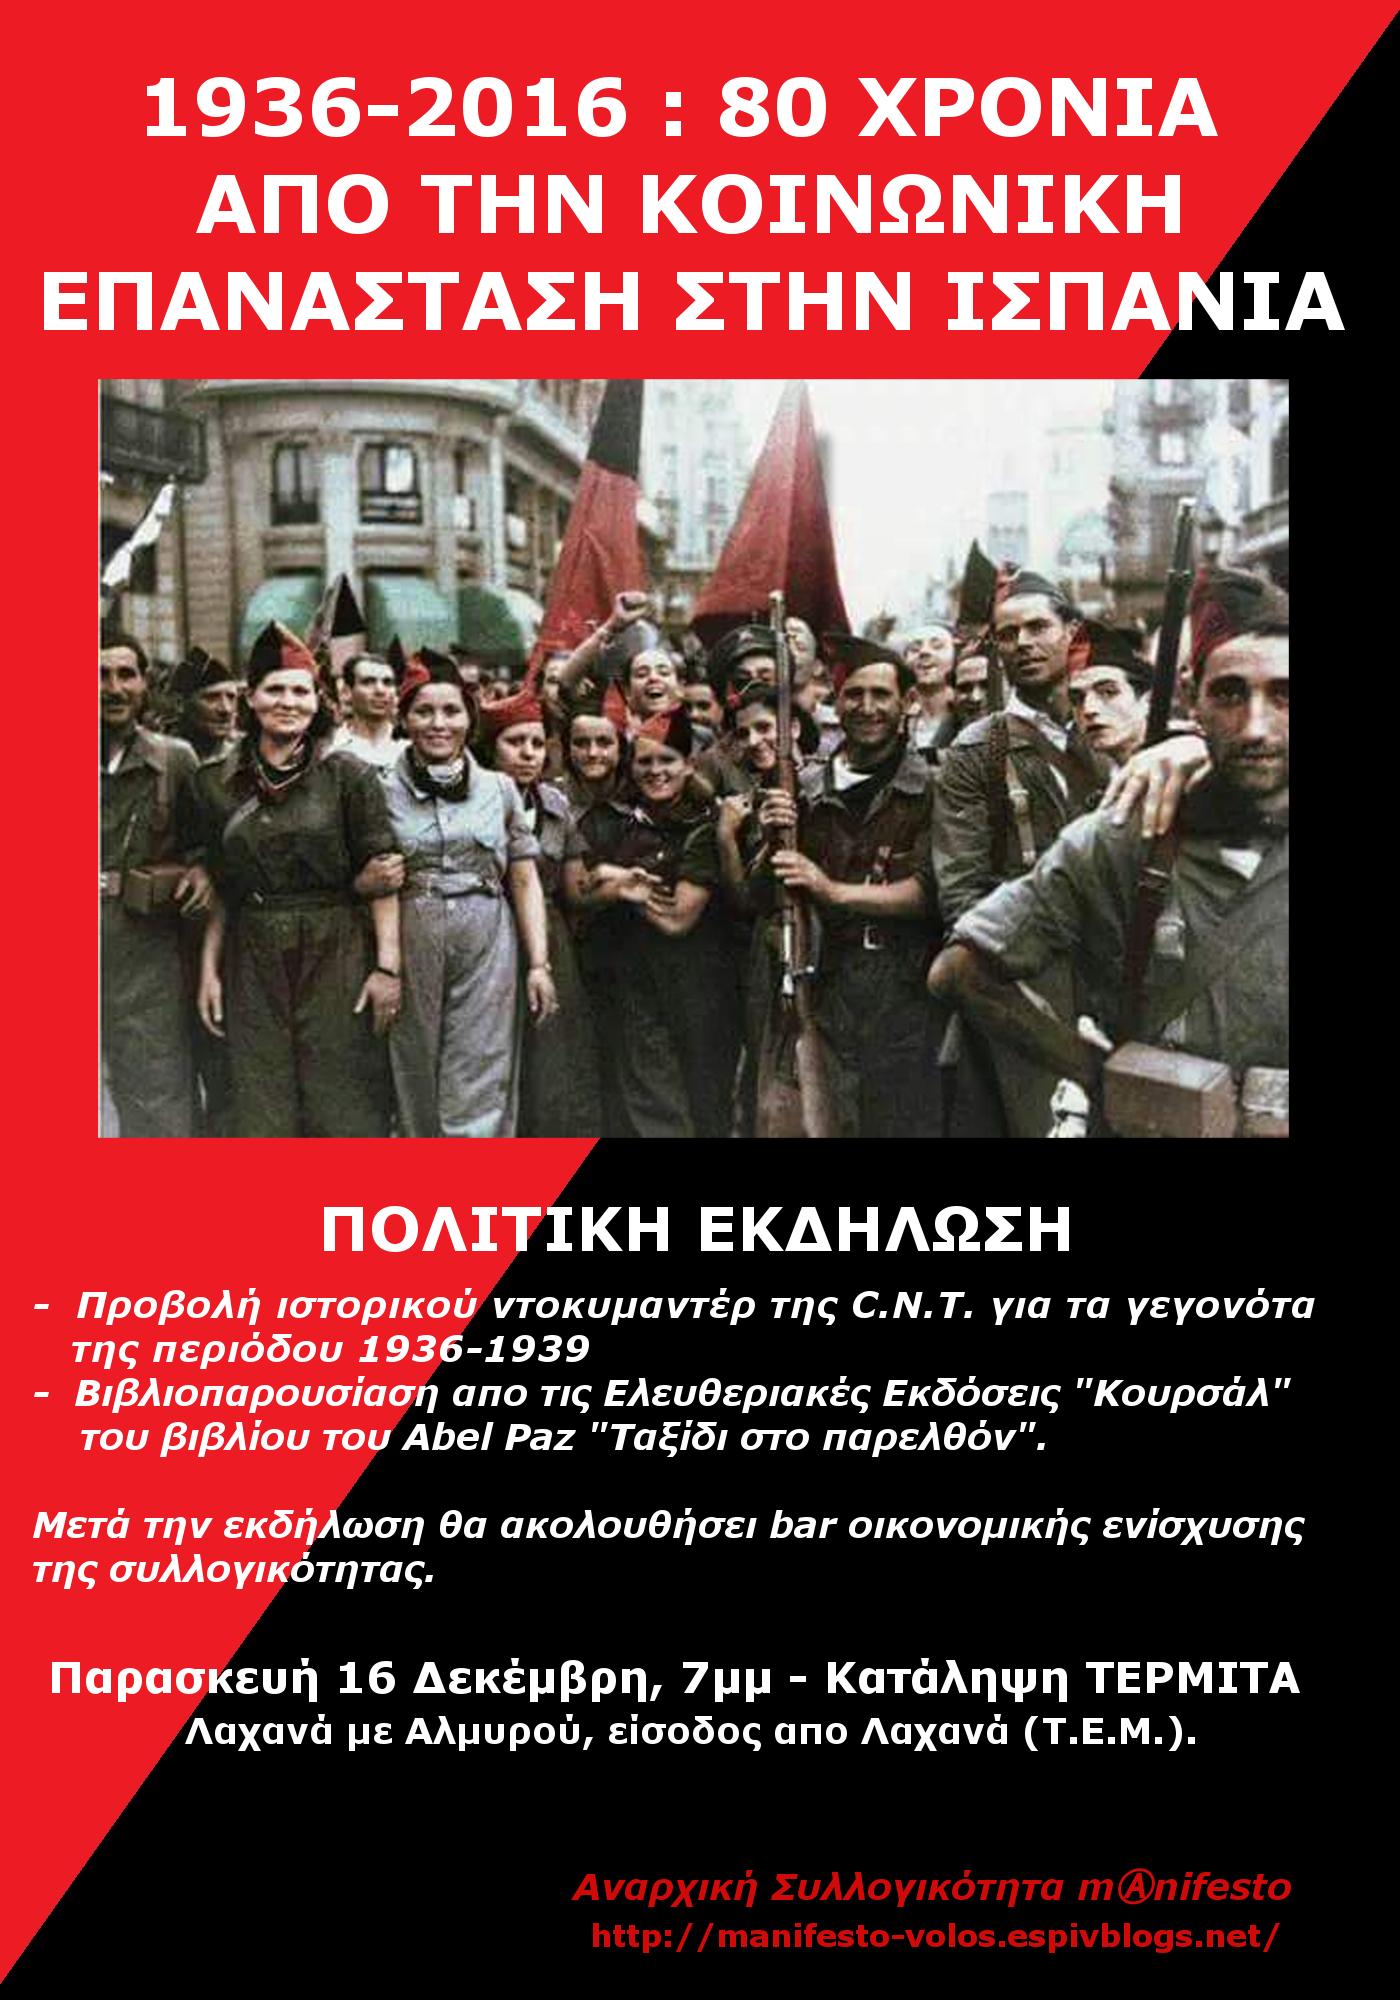 afisa_ekdil_16-12-16